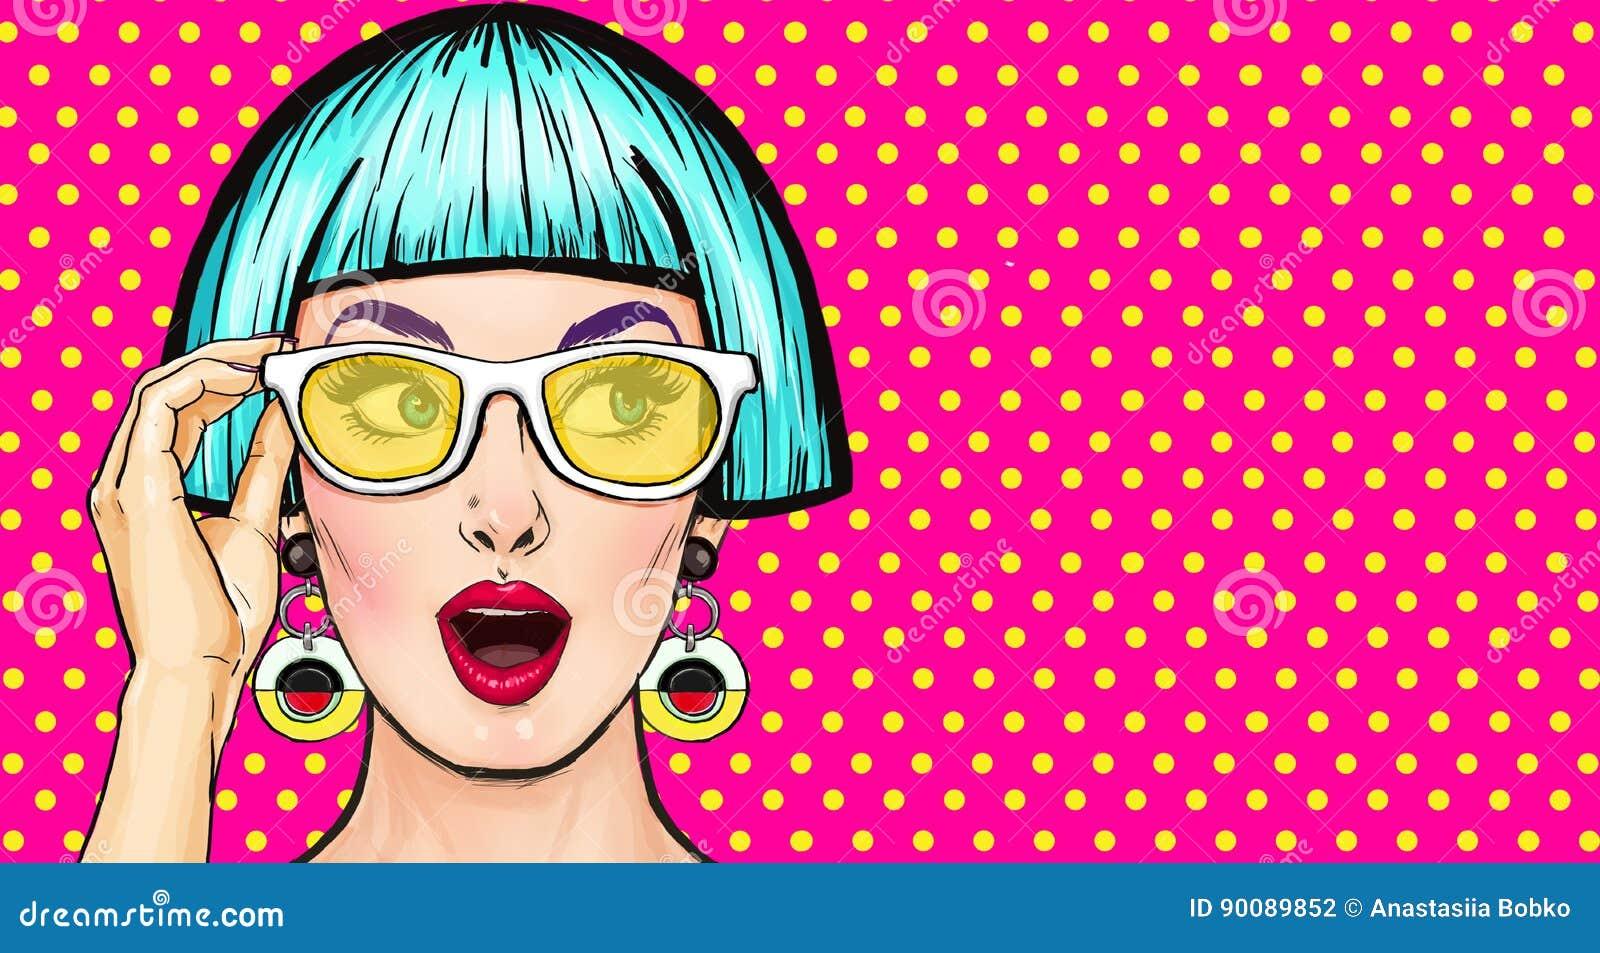 Amazed Pop Art Girl In Glasses Party InvitationBirthday CardComic WomanSexy